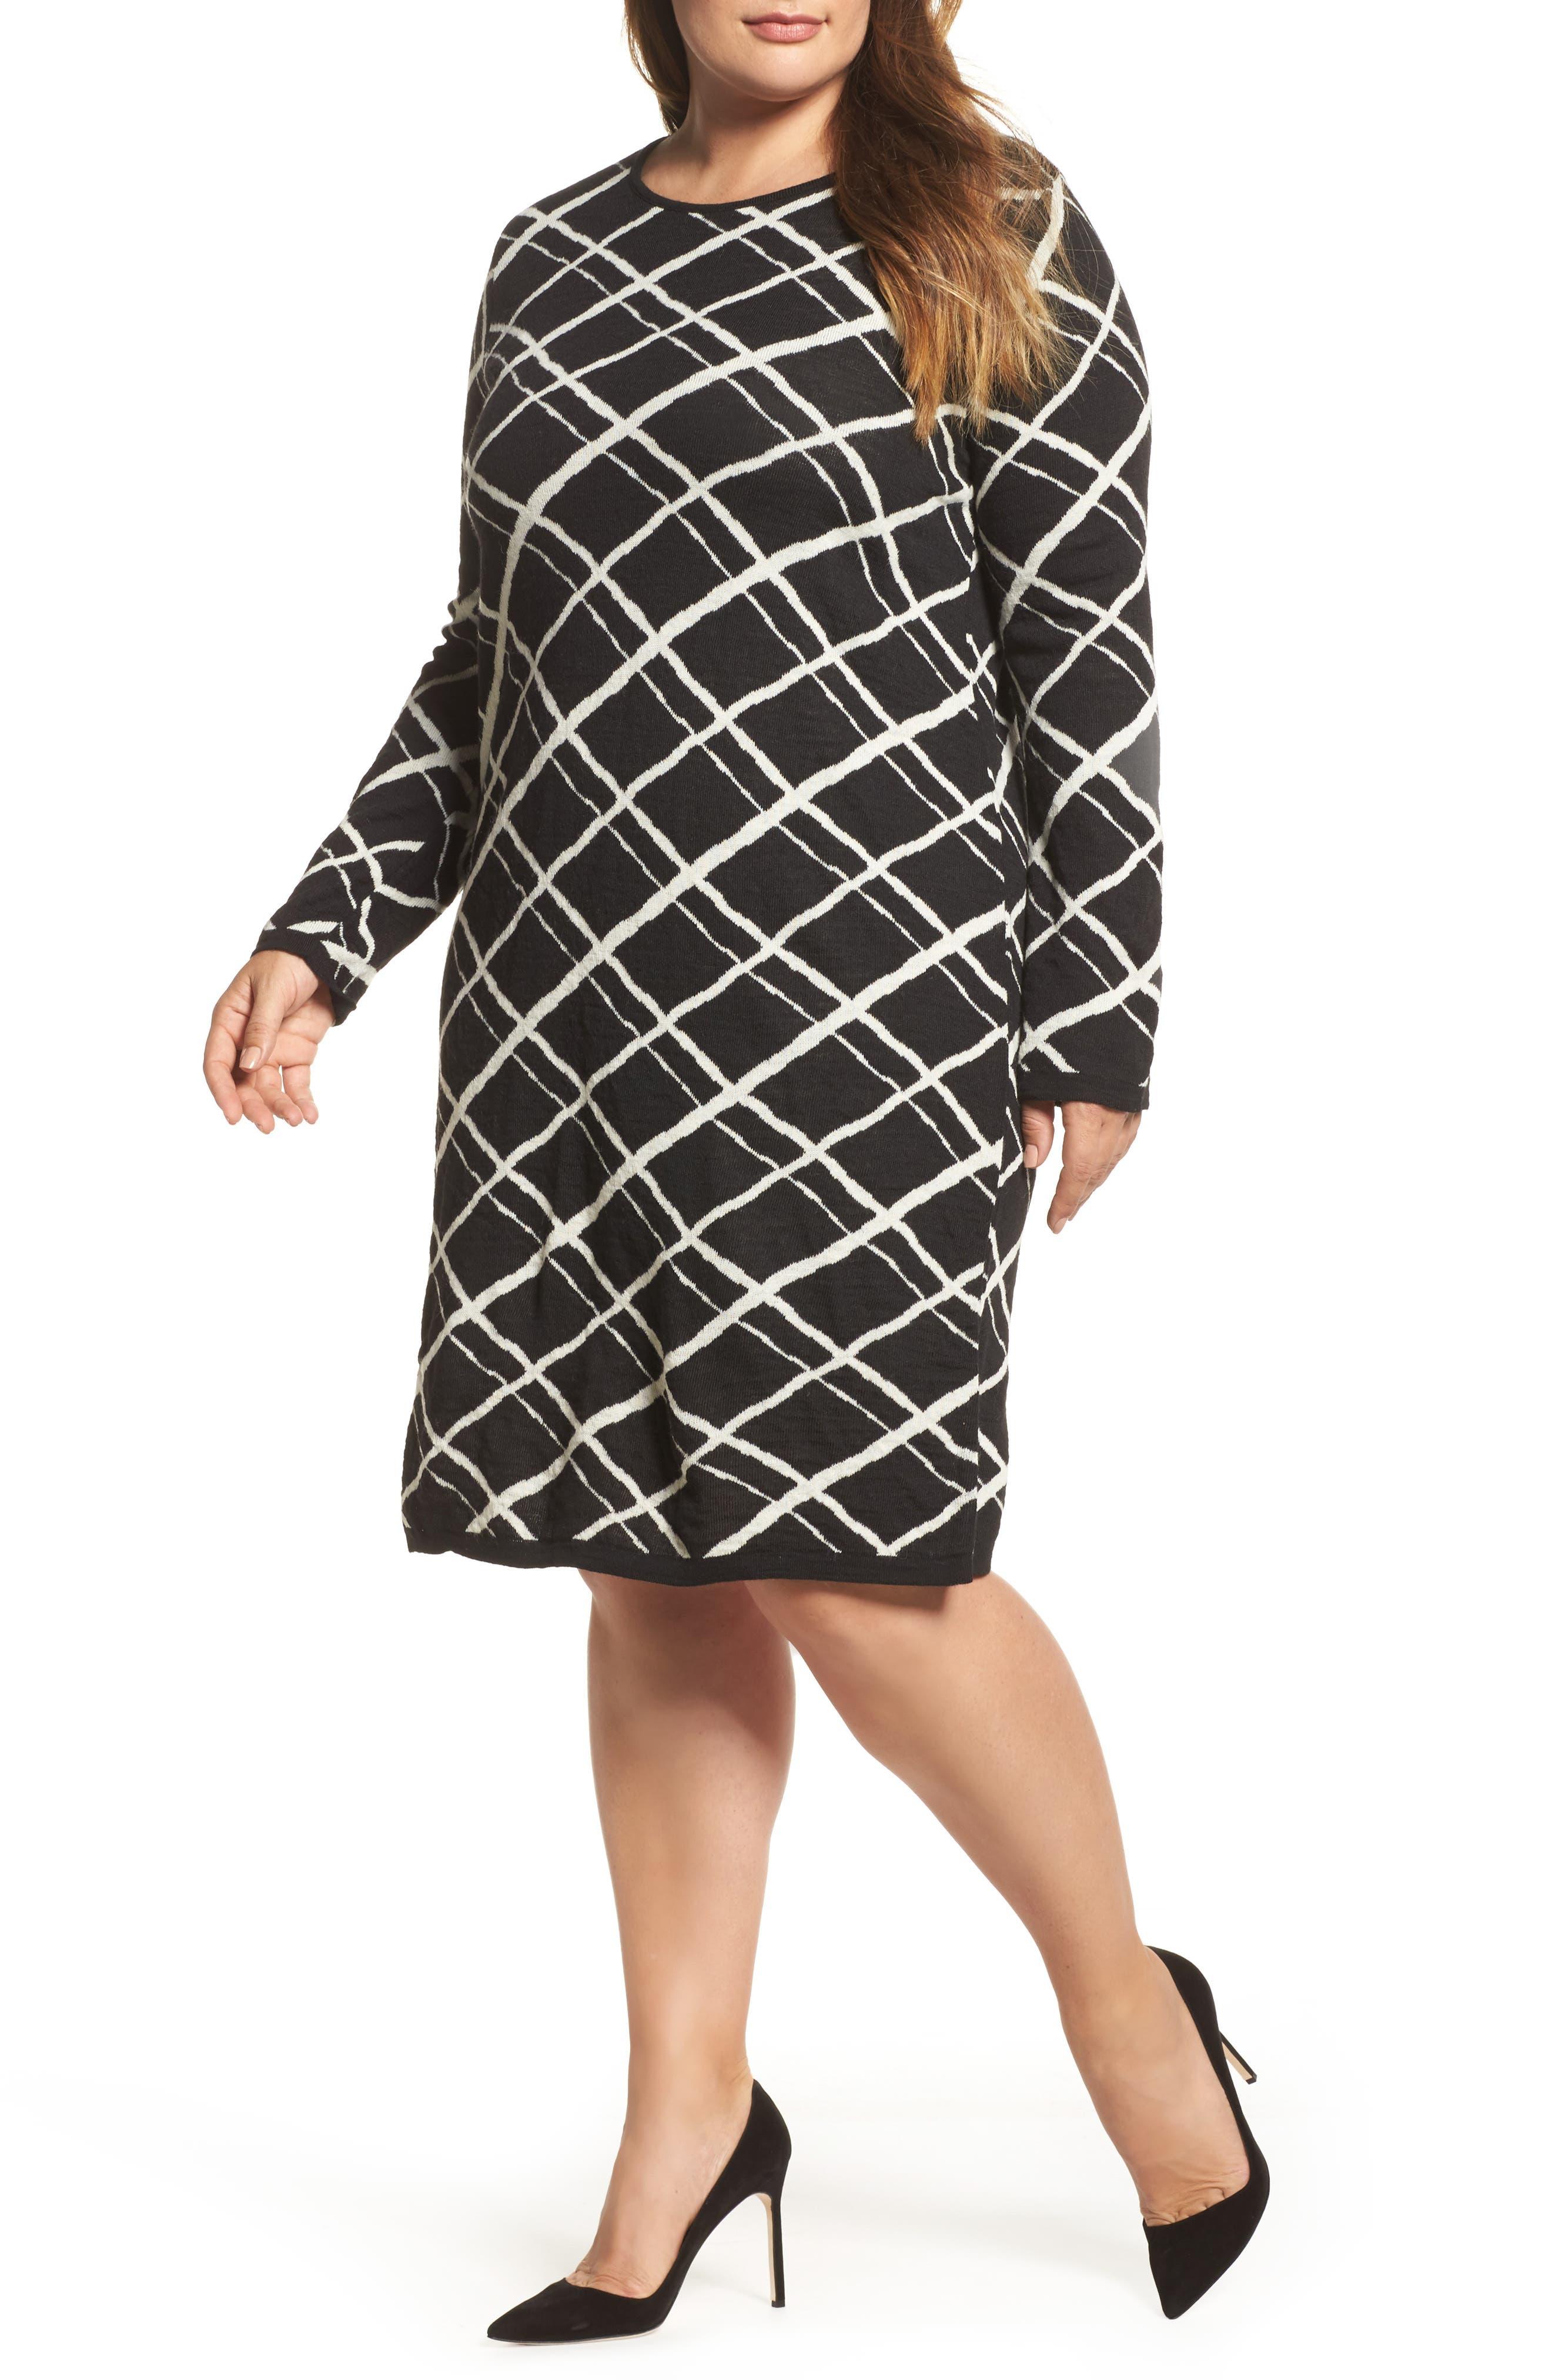 Genesi Checkered Knit Dress,                         Main,                         color, Black/ White